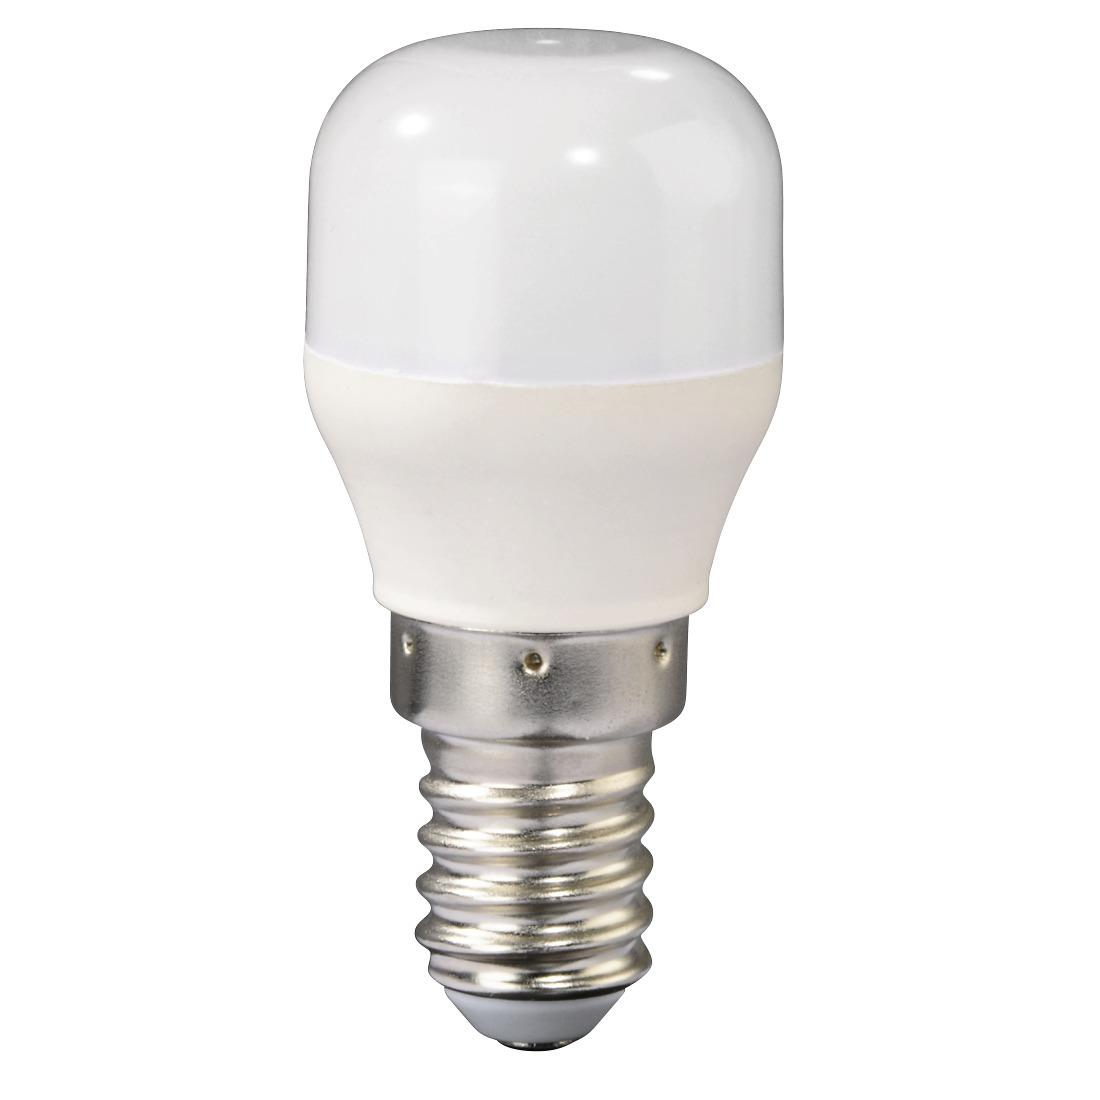 Korting Xavax Koelkast LED lamp 2.5W E14 Koelkast accessoire